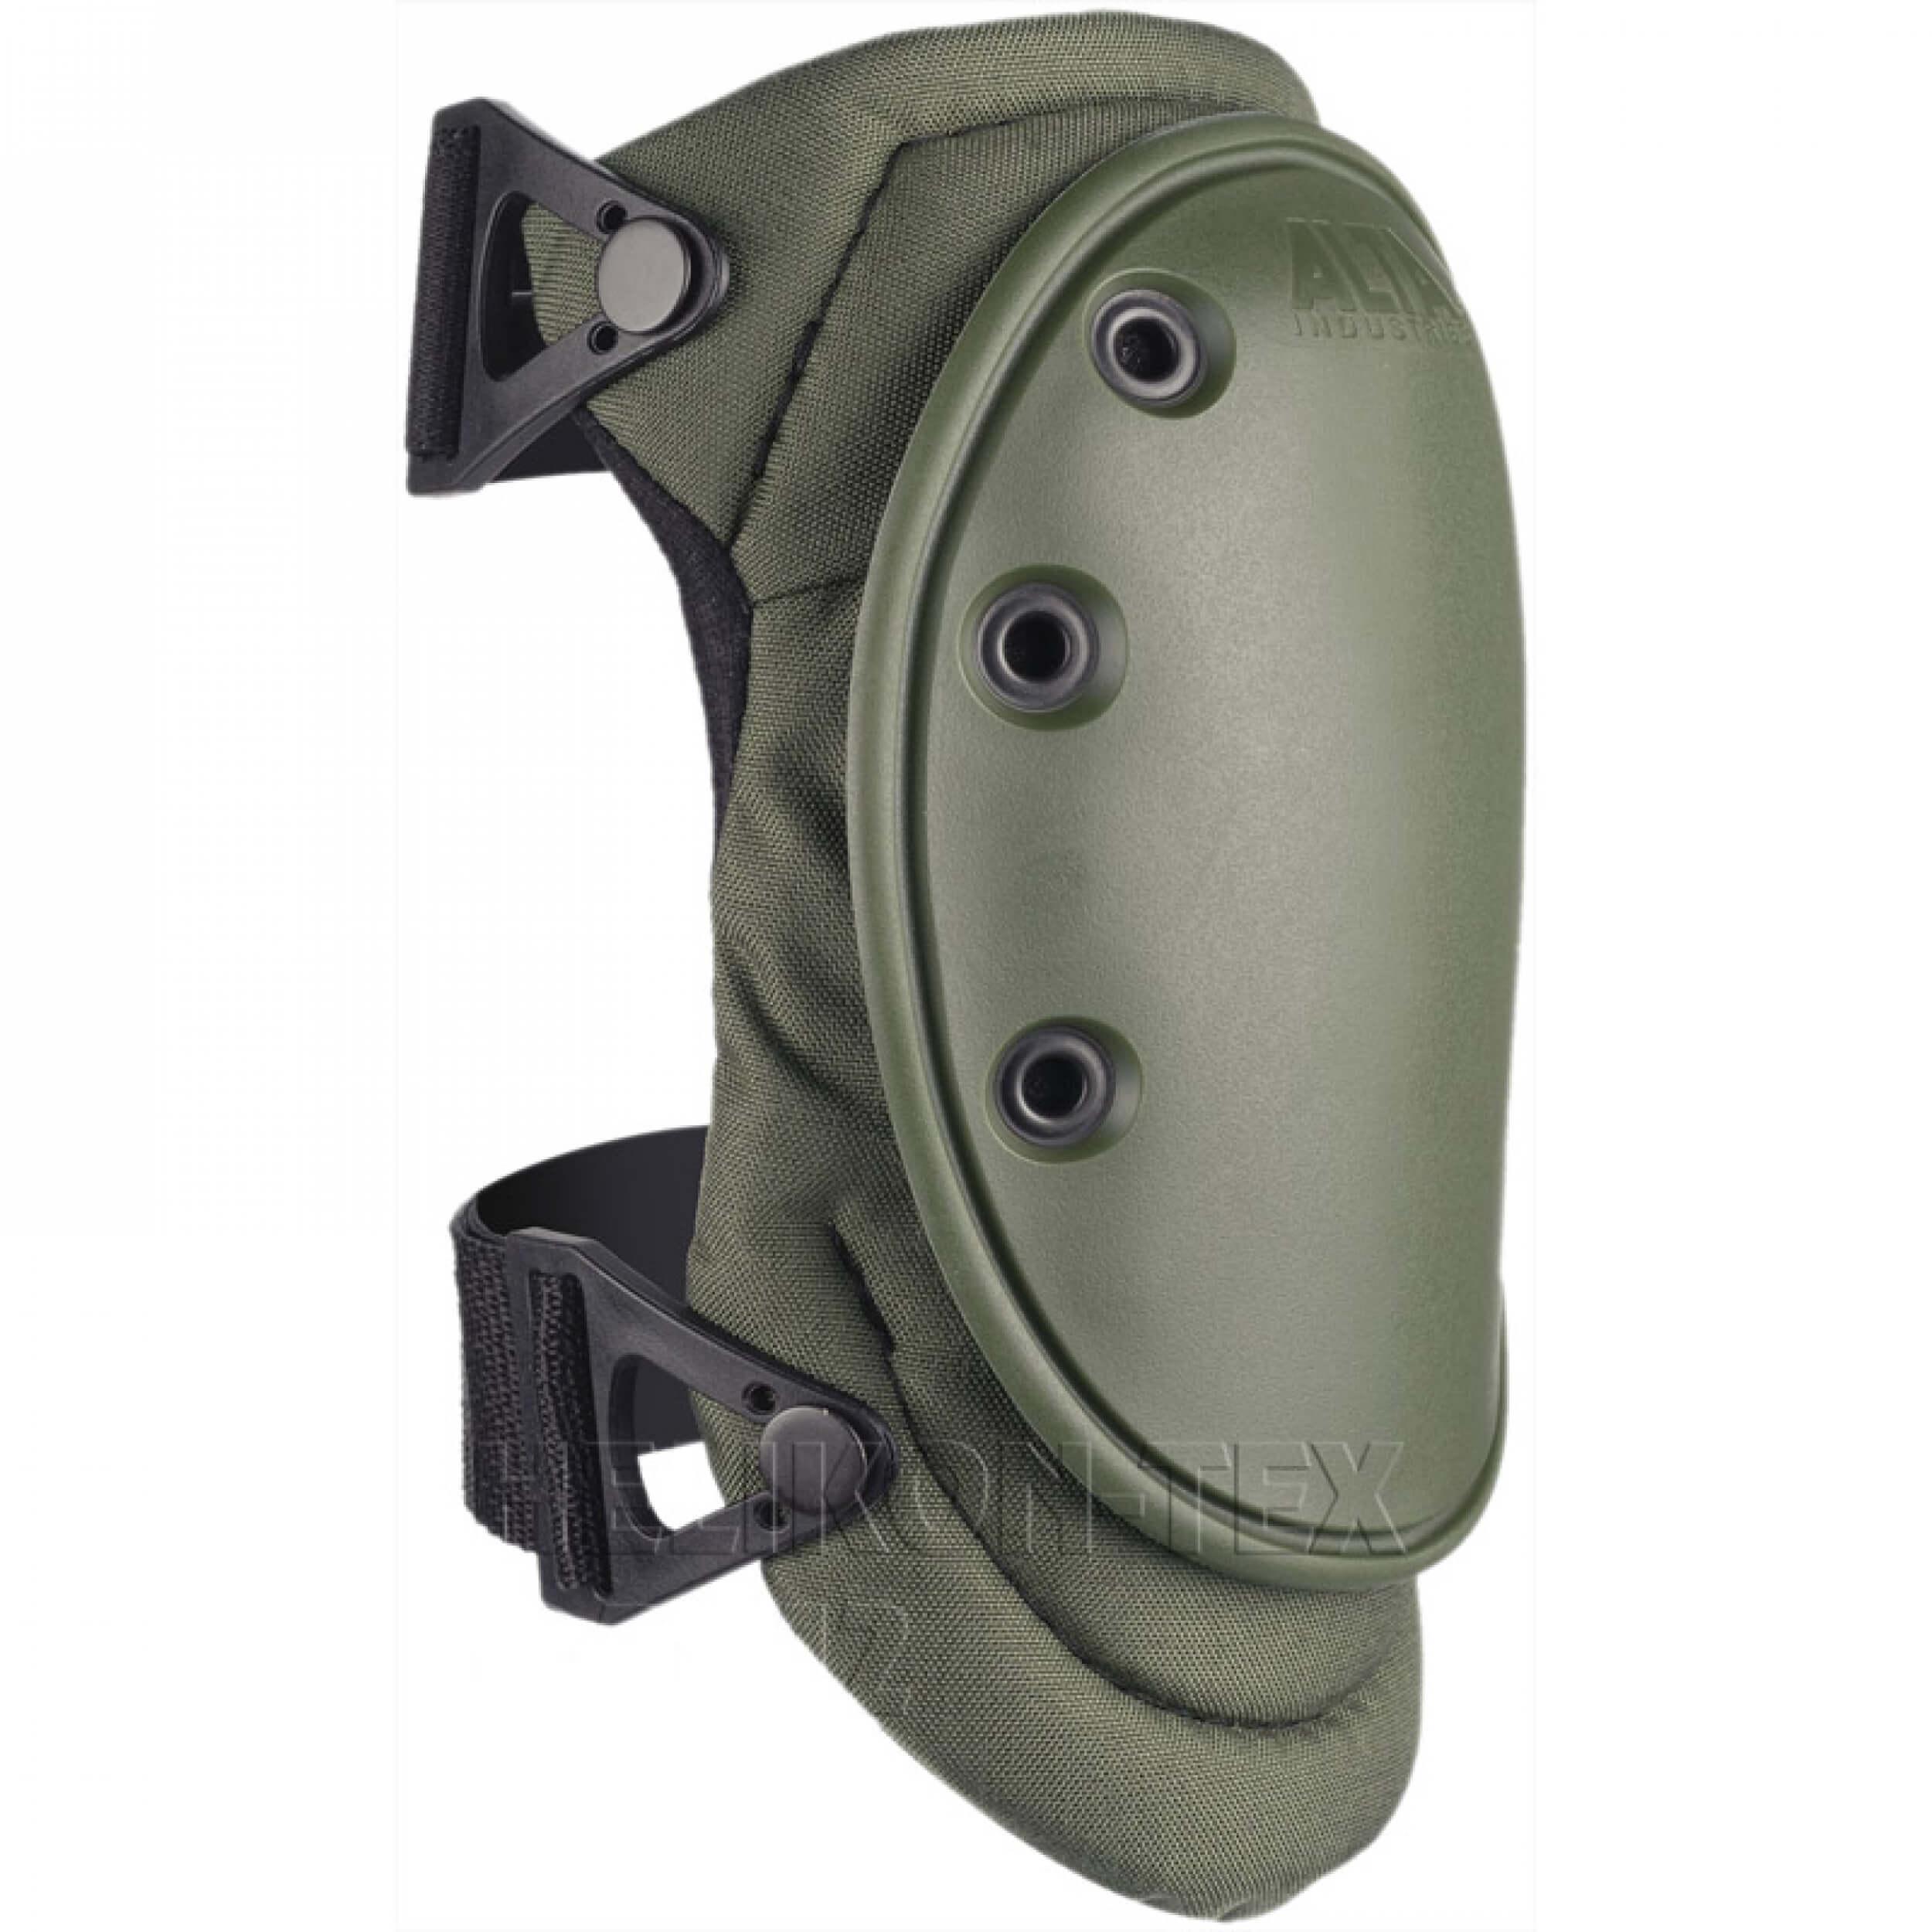 ALTA Industries AltaFlex Knee Protector AltaLok oliv